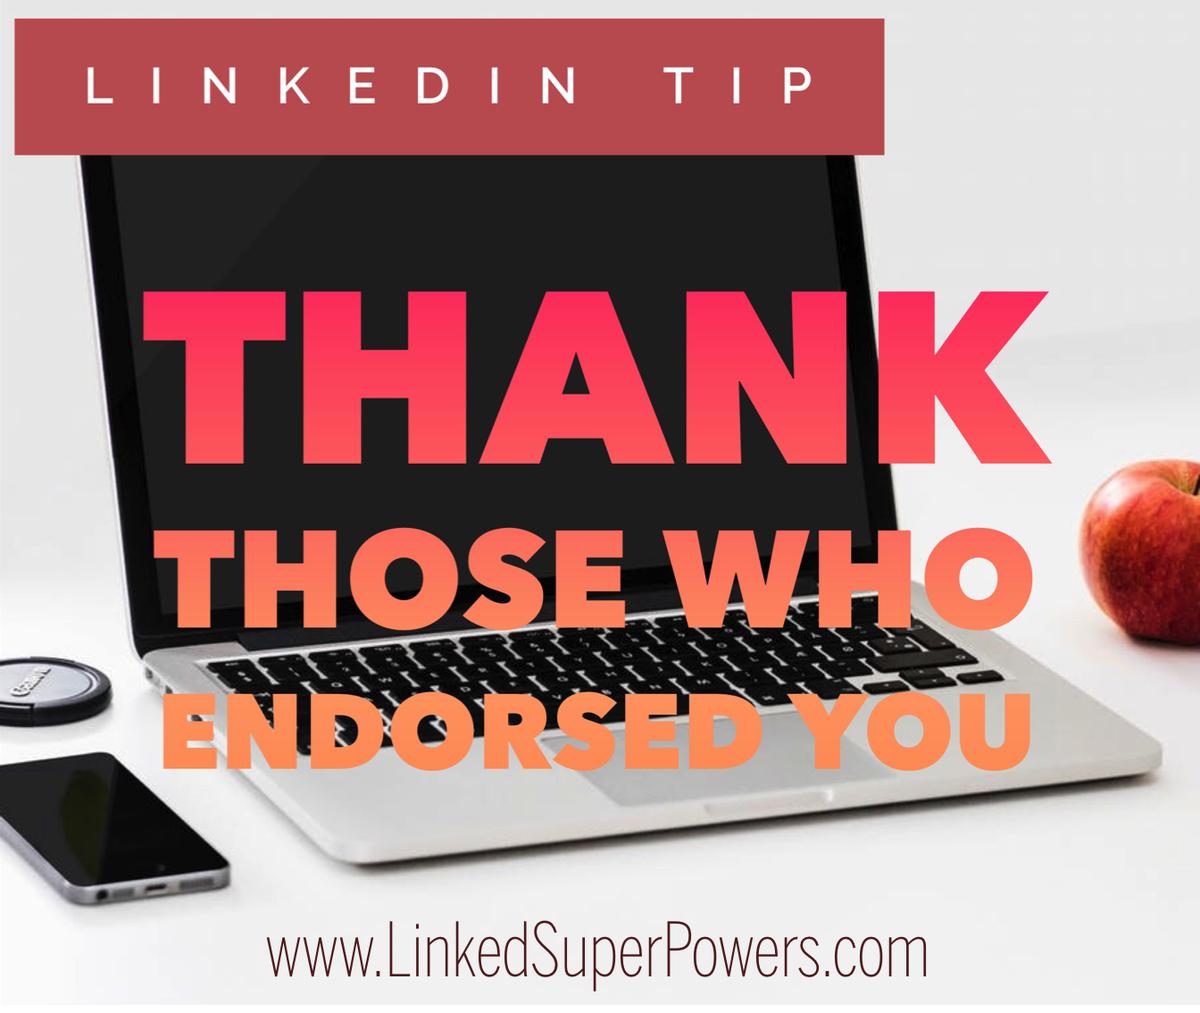 For numerous LinkedIn Tips &amp; Strategies, visit our Blog at:  https:// linkedsuperpowers.com/blog  &nbsp;   #LinkedIn #Endorsements  #Tip #LinkedSuperPowers<br>http://pic.twitter.com/XutKpbnnLI